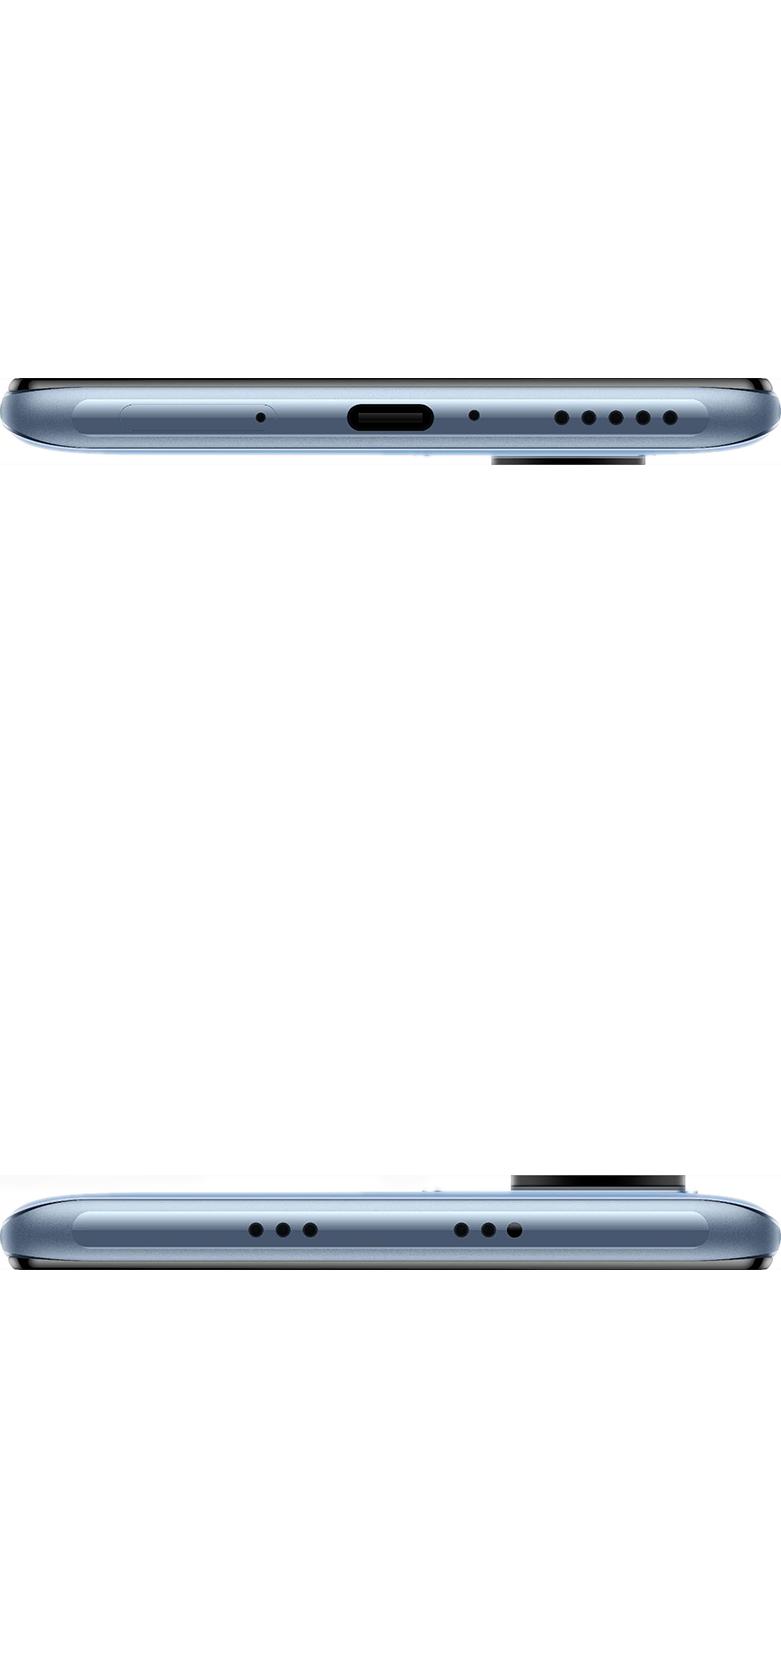 Mi 11X Celestial Silver 6GB | 128GB